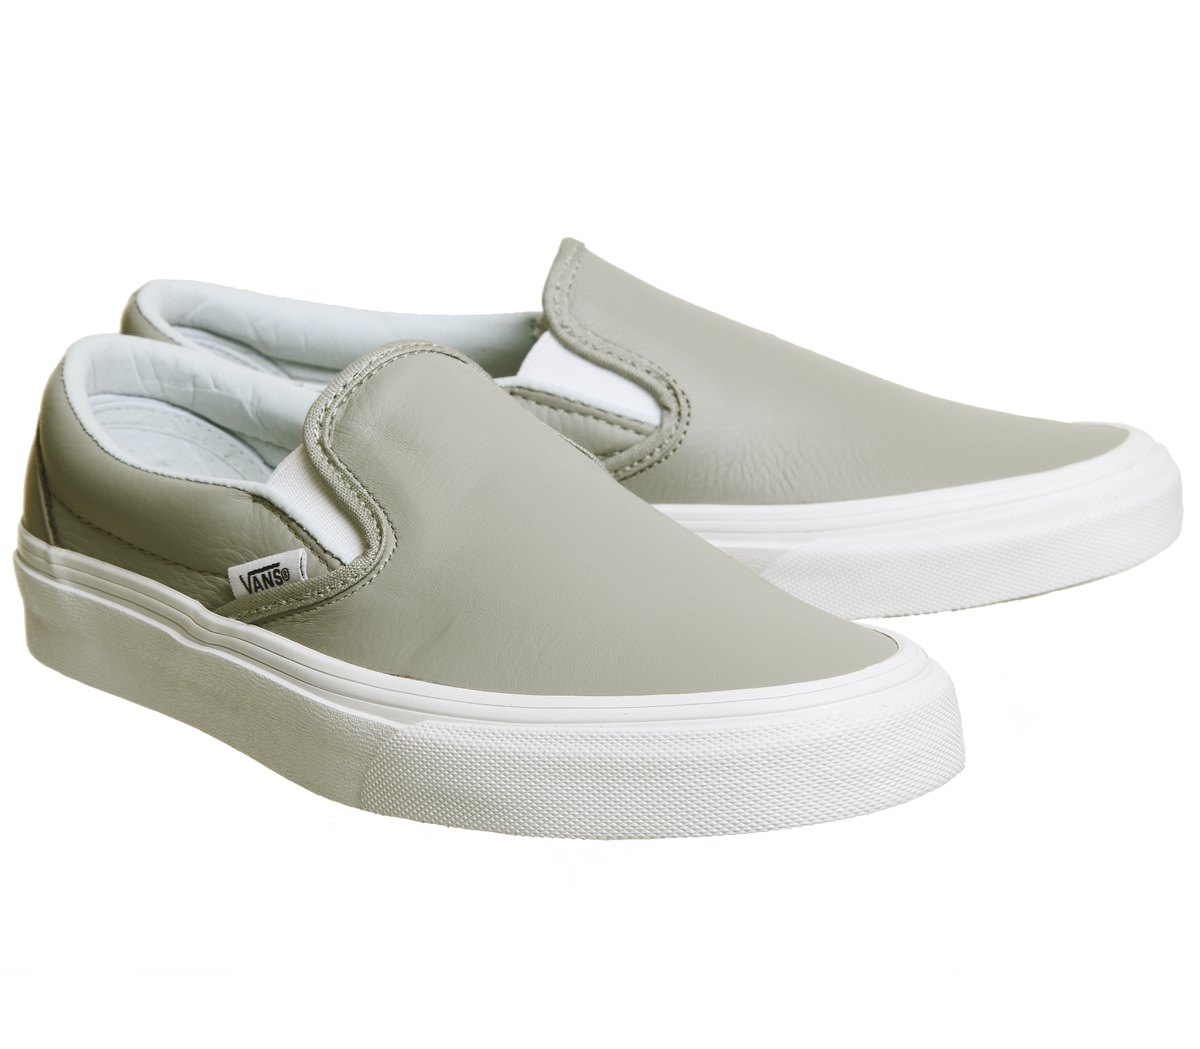 Grigio 42 EU Vans Classic SlipOn Sneaker Infilare UnisexAdulto y5u